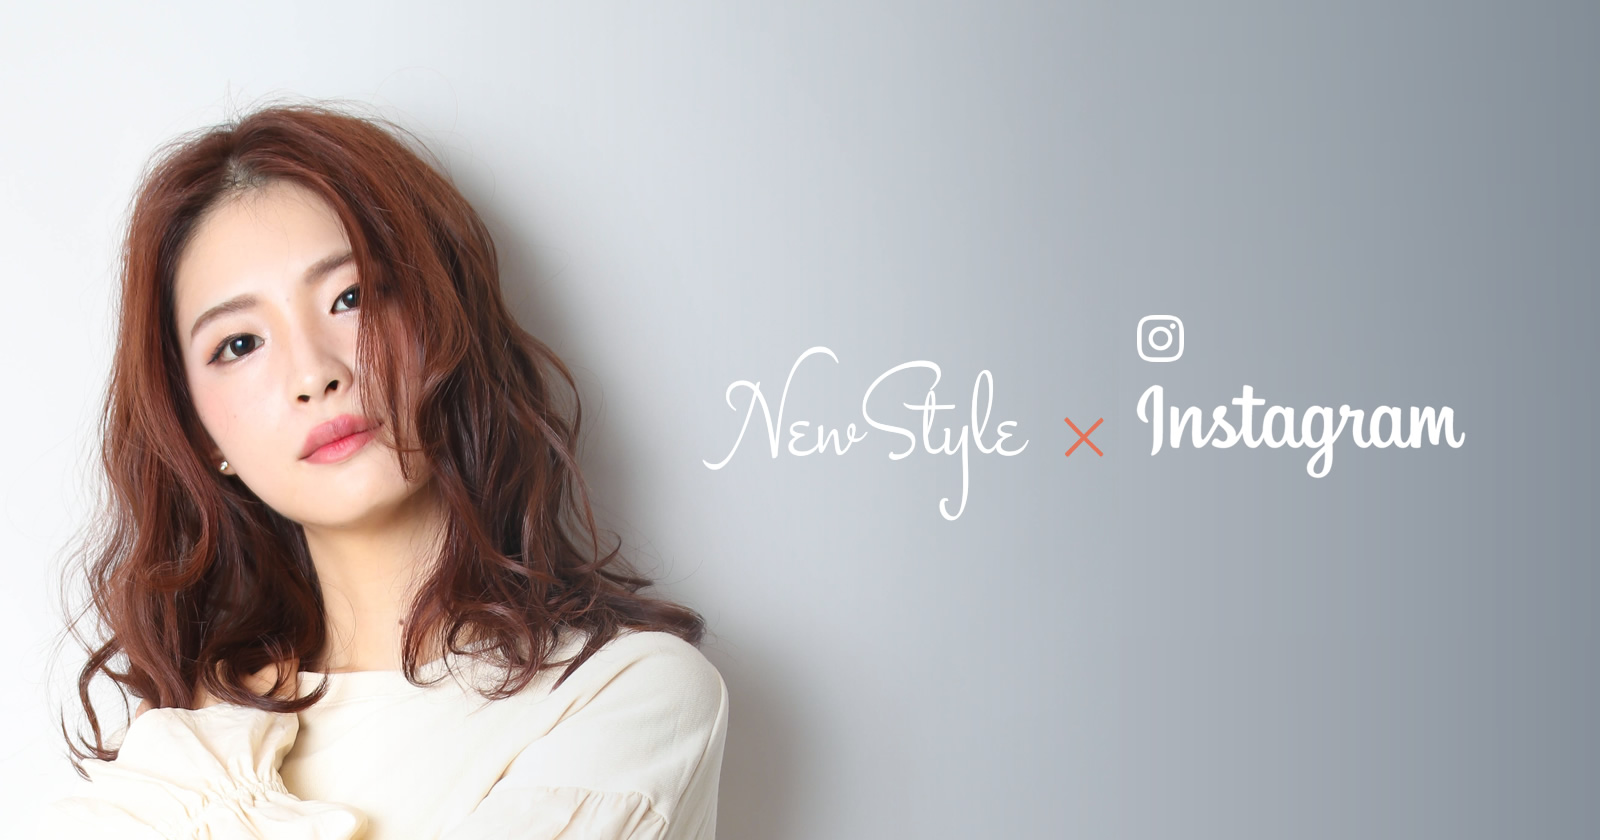 NewStyle x Instagram